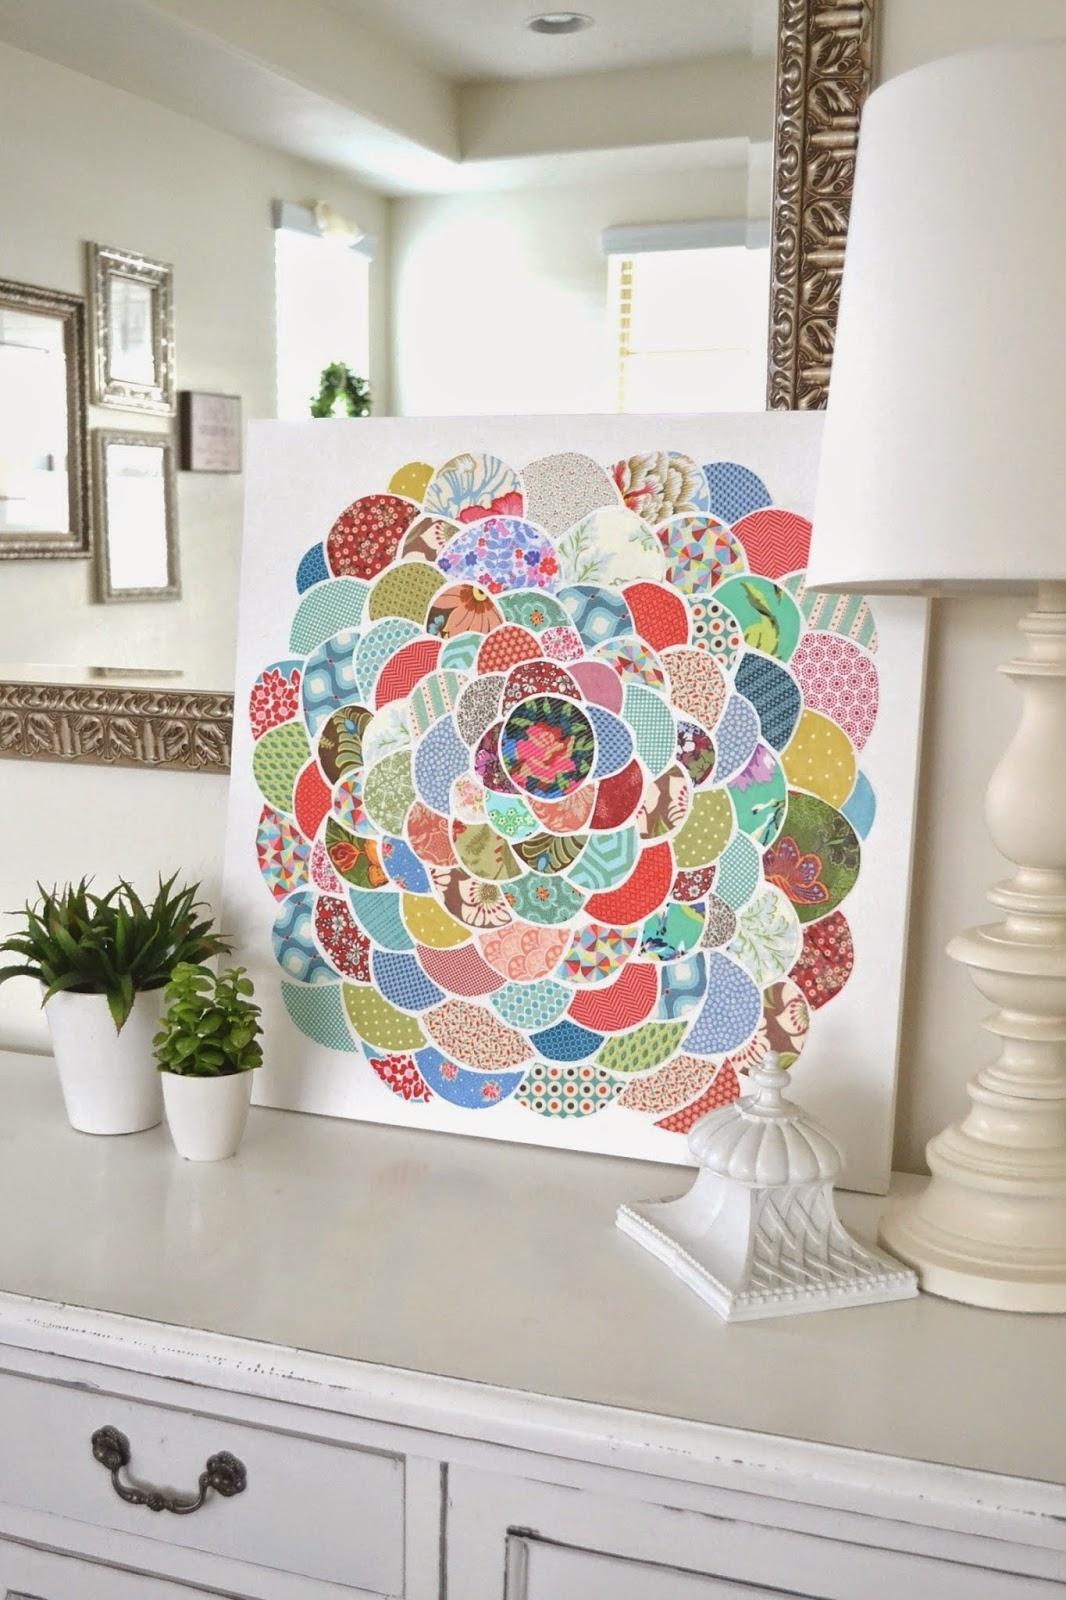 Tea Rose Home: Anthro Inspired ~ Canvas Flower Wall Art Regarding 2018 Fabric Circle Wall Art (View 7 of 15)